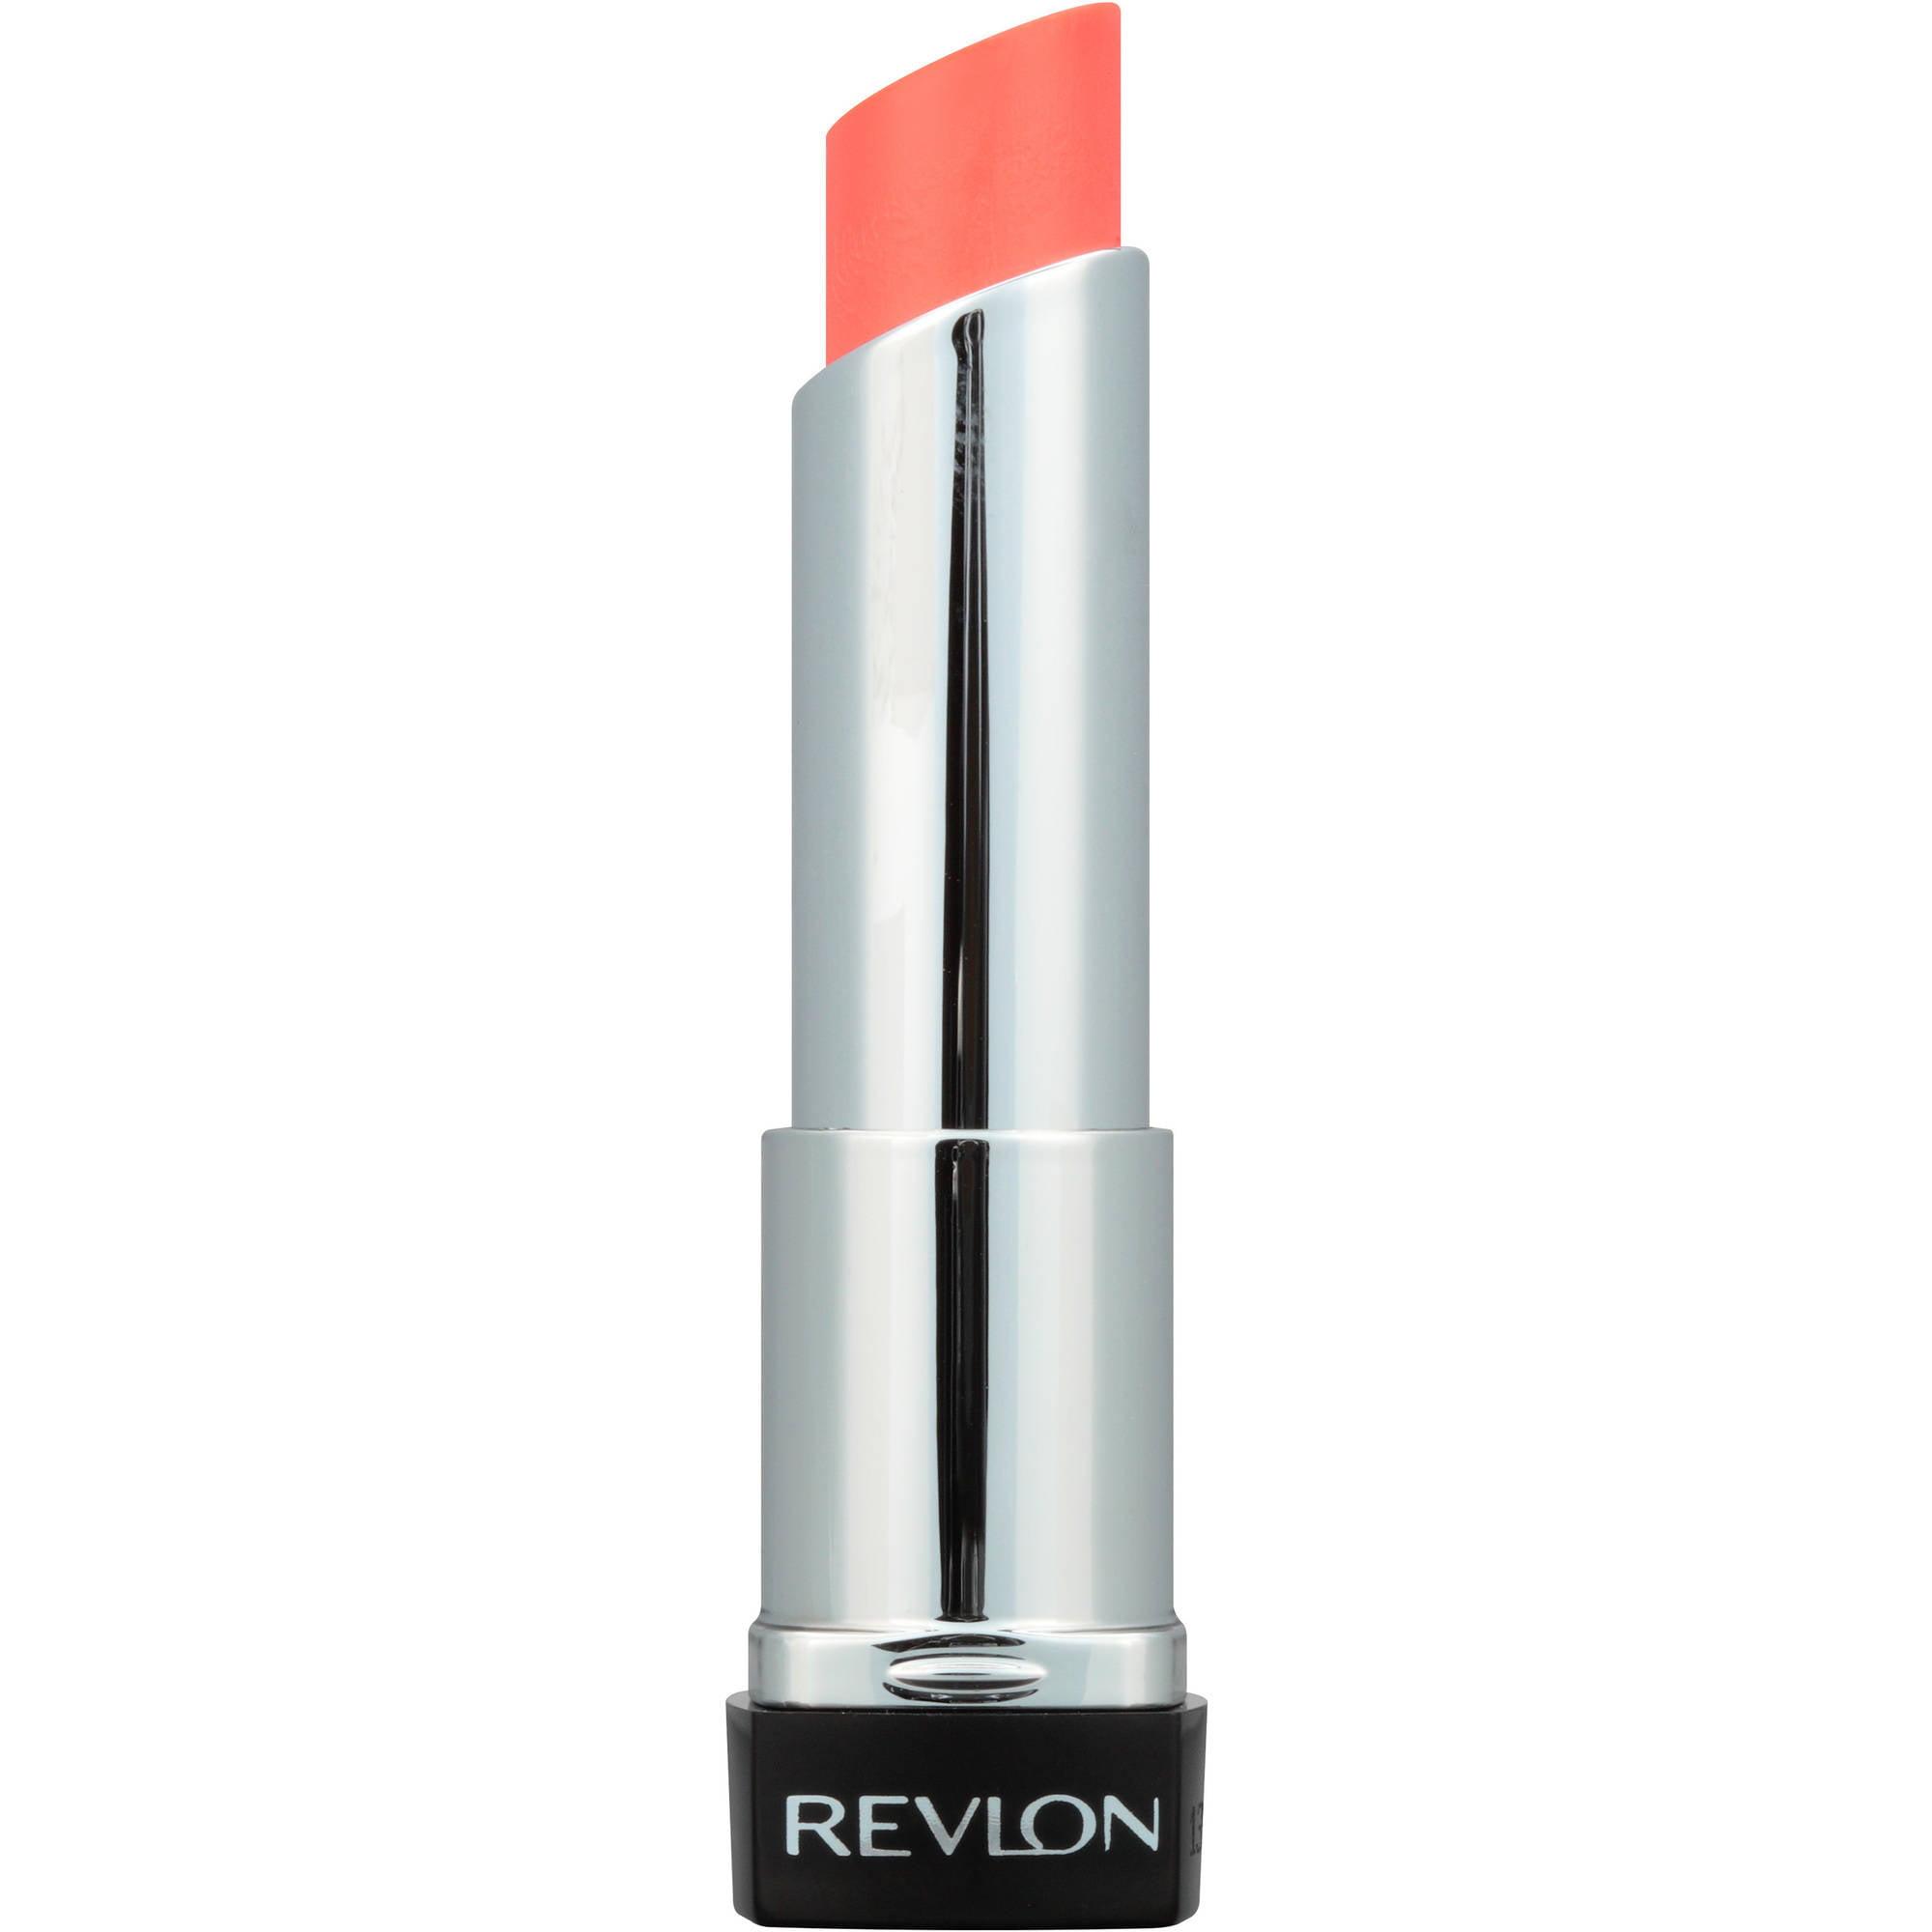 Revlon ColorBurst Lip Butter, 027 Juicy Papaya, 0.09 oz